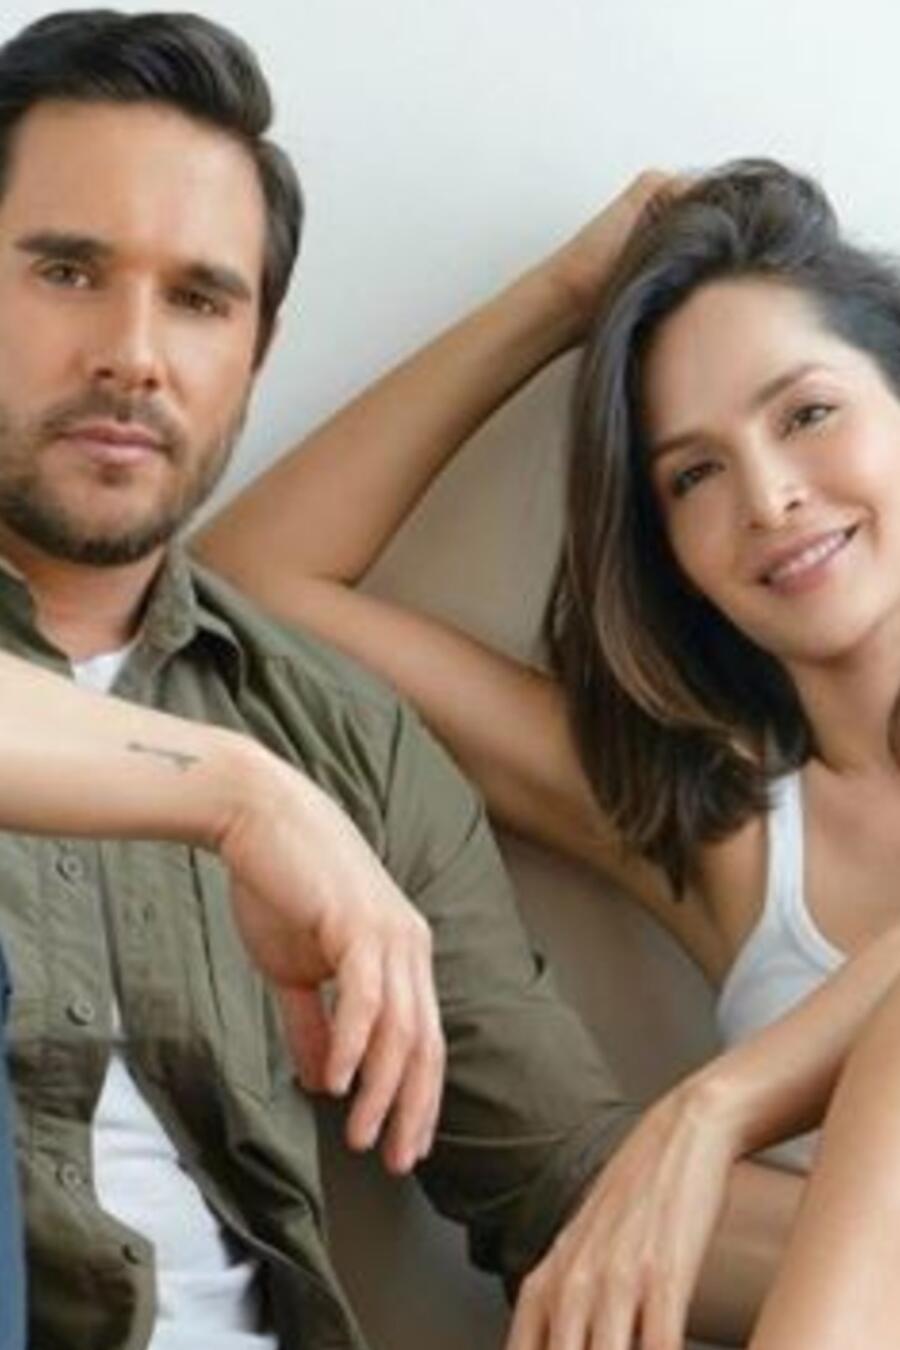 Carmen Villalobos y Sebastián Caicedo posando juntos